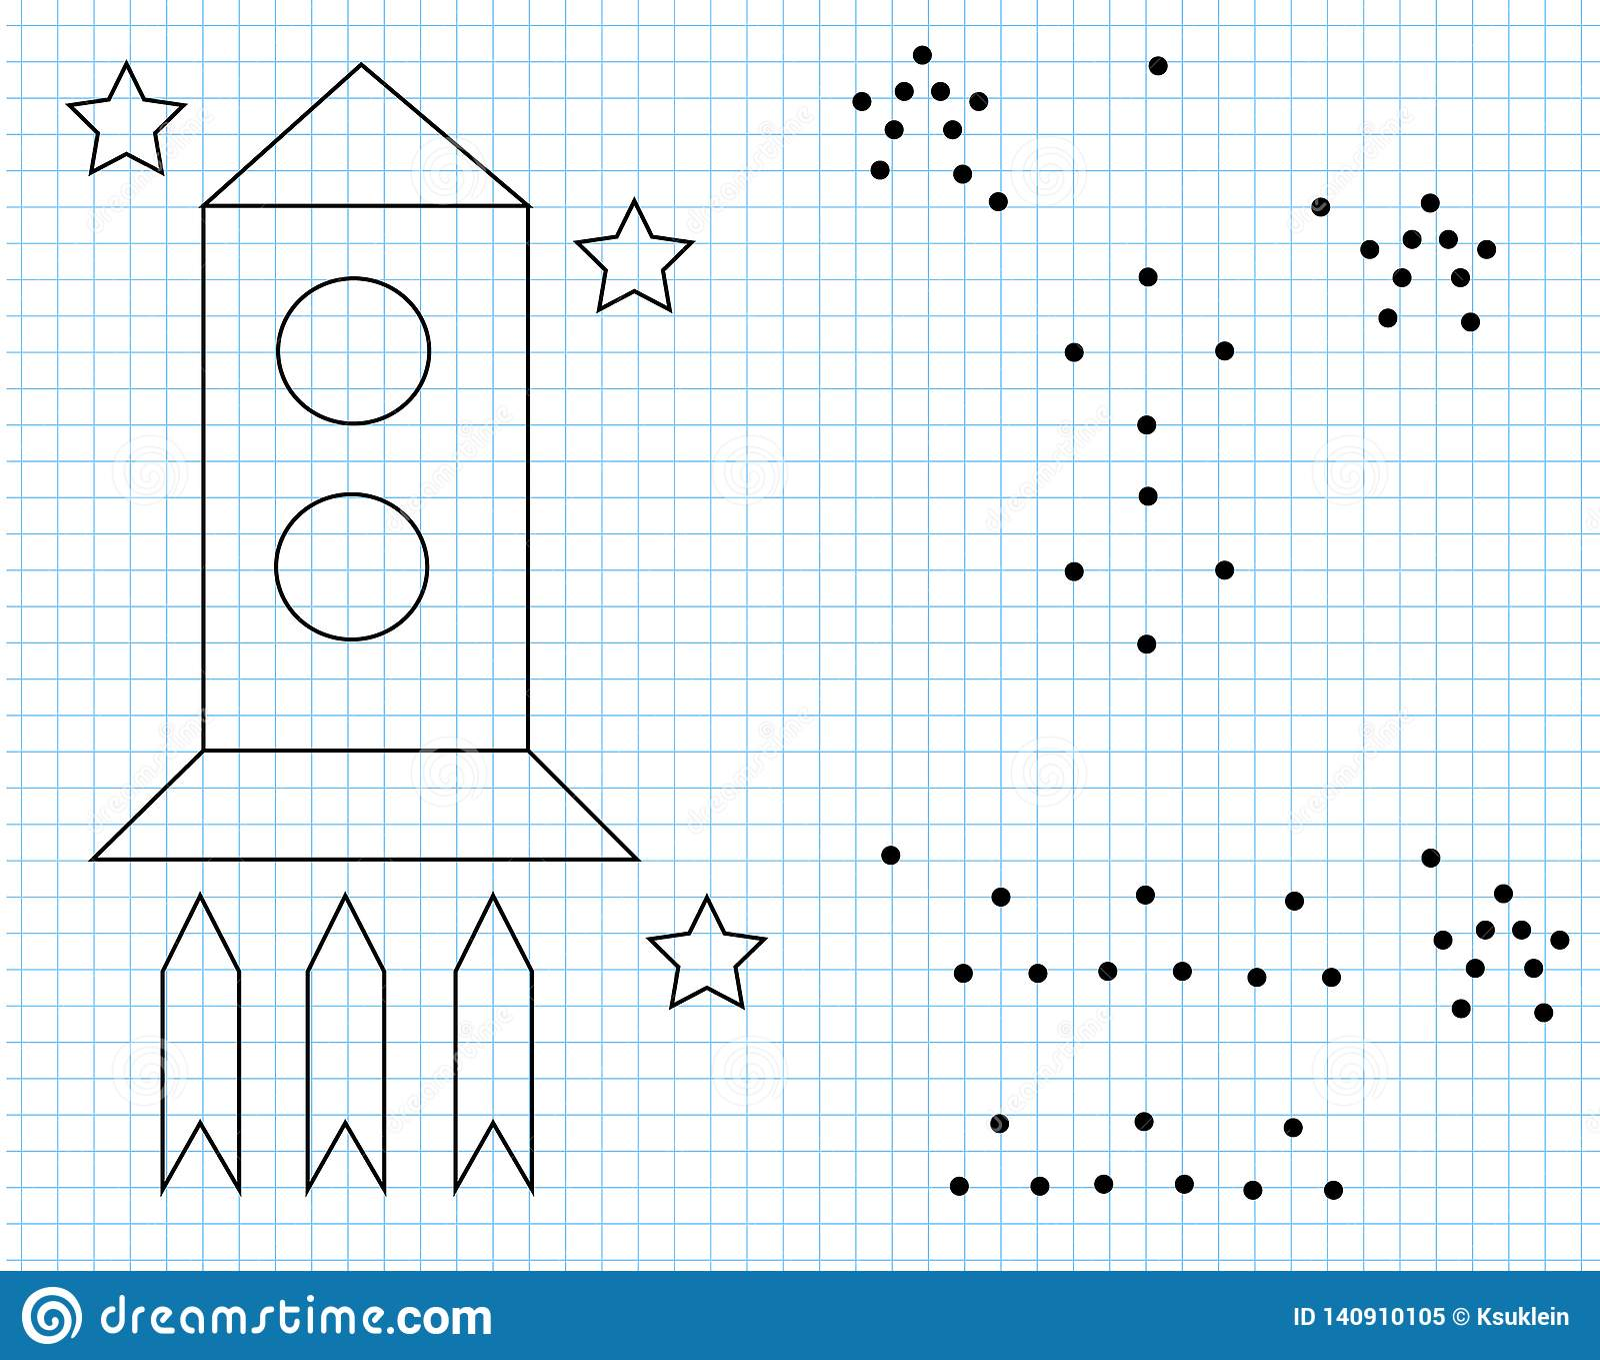 Grid Copy Worksheet Educational Children Game Drawing